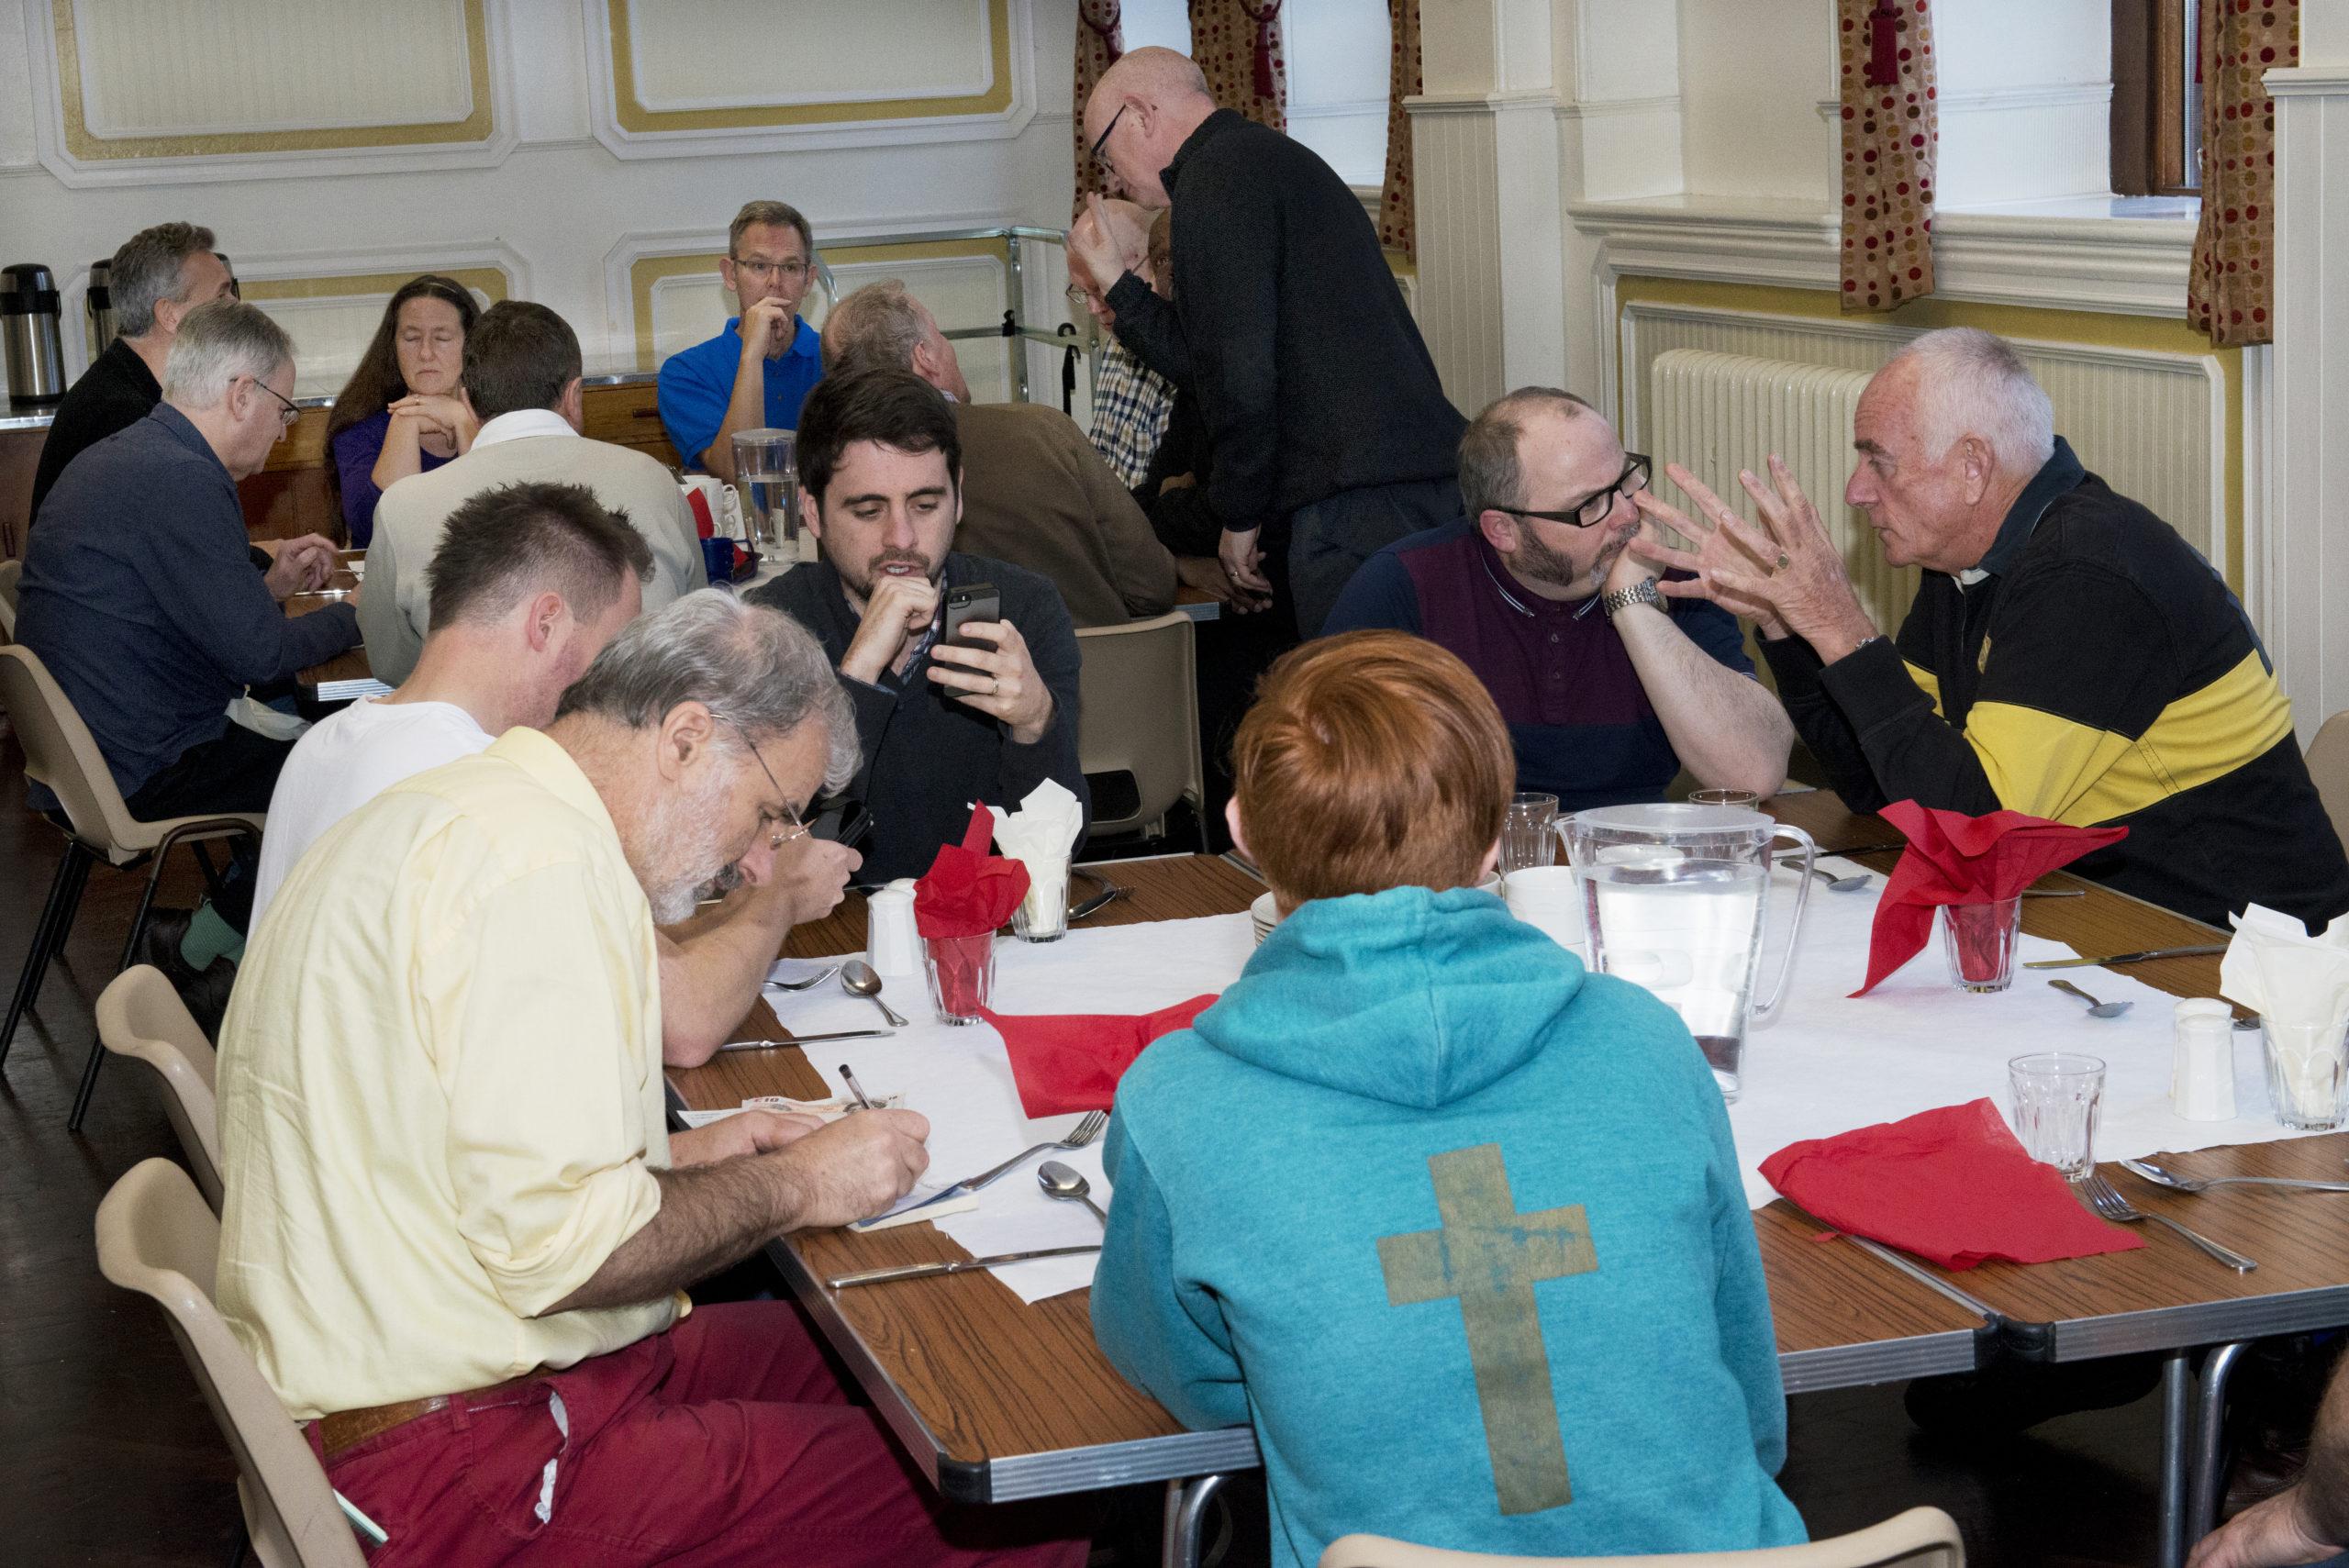 Evangelist conference